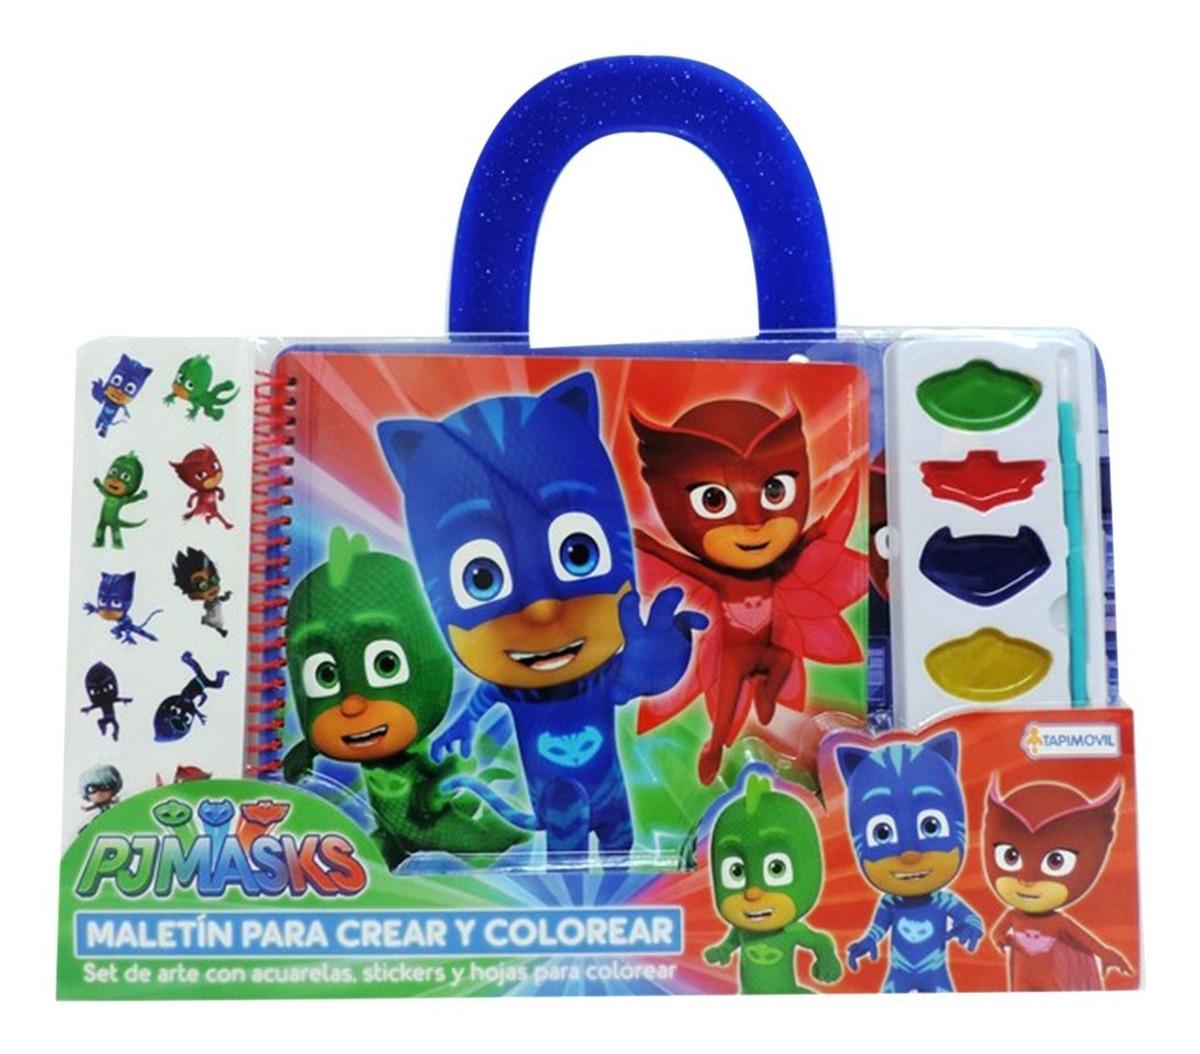 Maletin De Dibujos Para Colorear Héroes En Pijamas Tapimovil